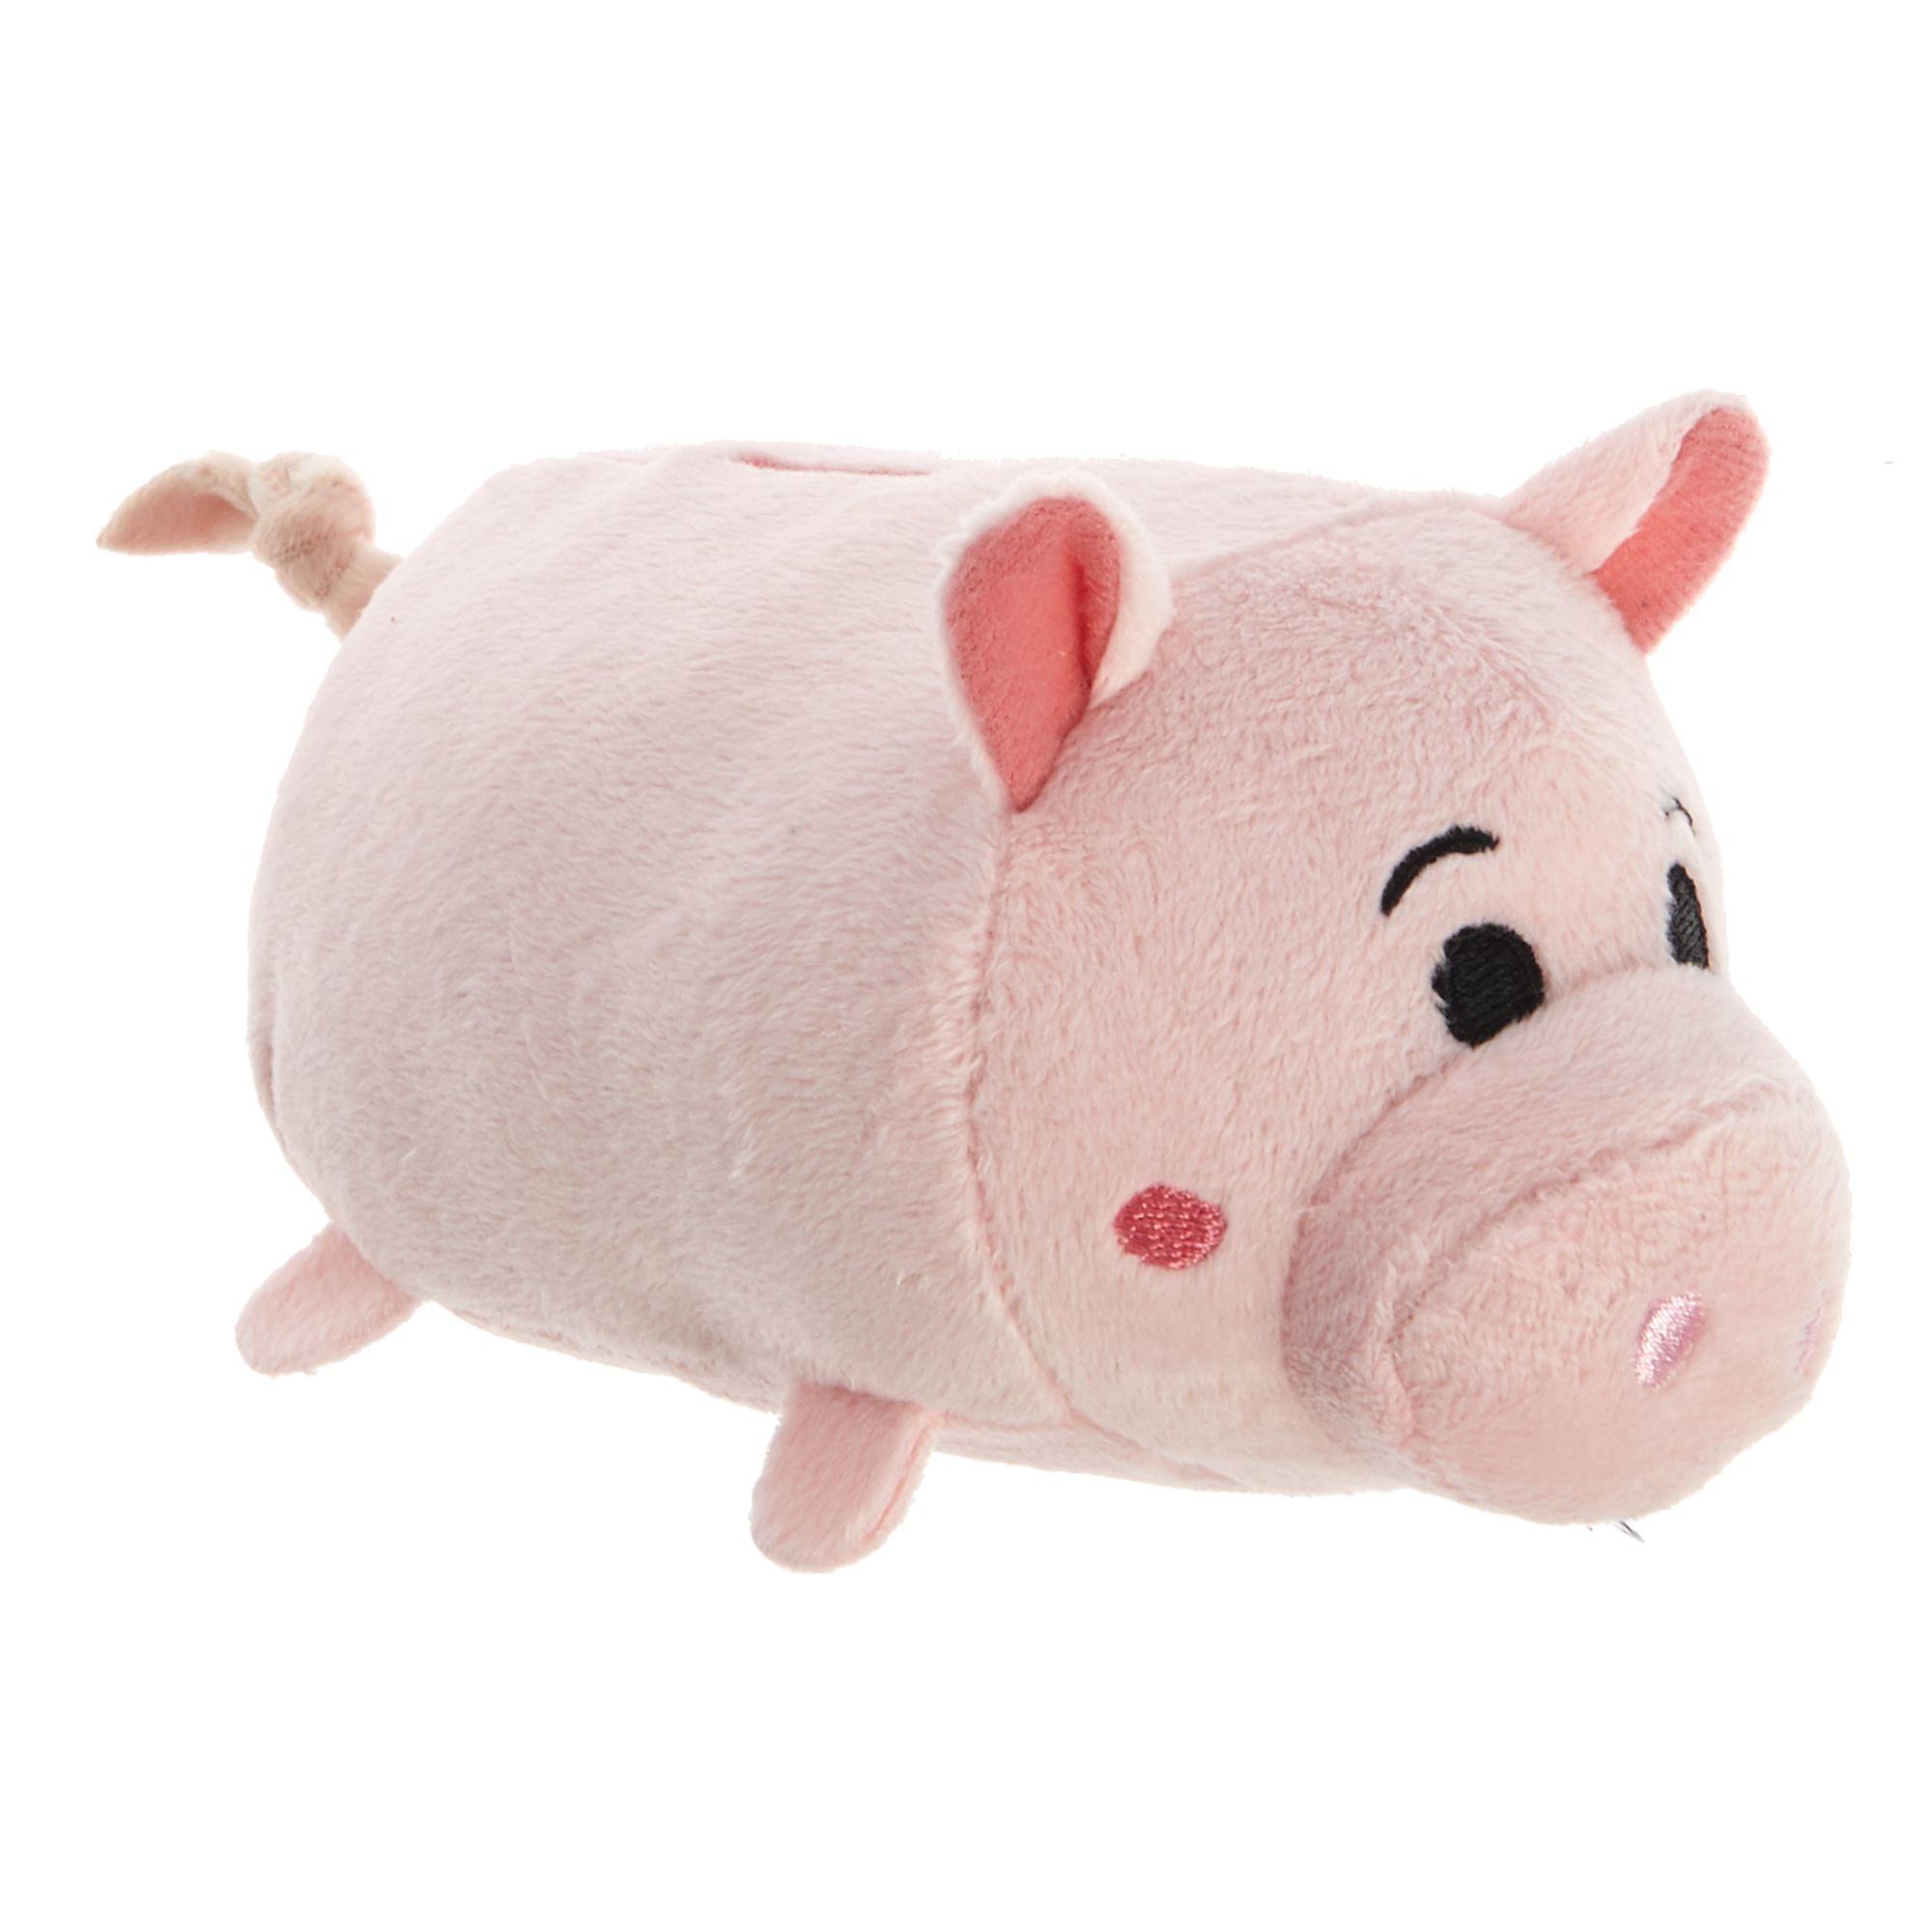 "Disney Hamm ""Tsum Tsum"" Dog Toy - Plush, Squeaker size: Small 5274214"